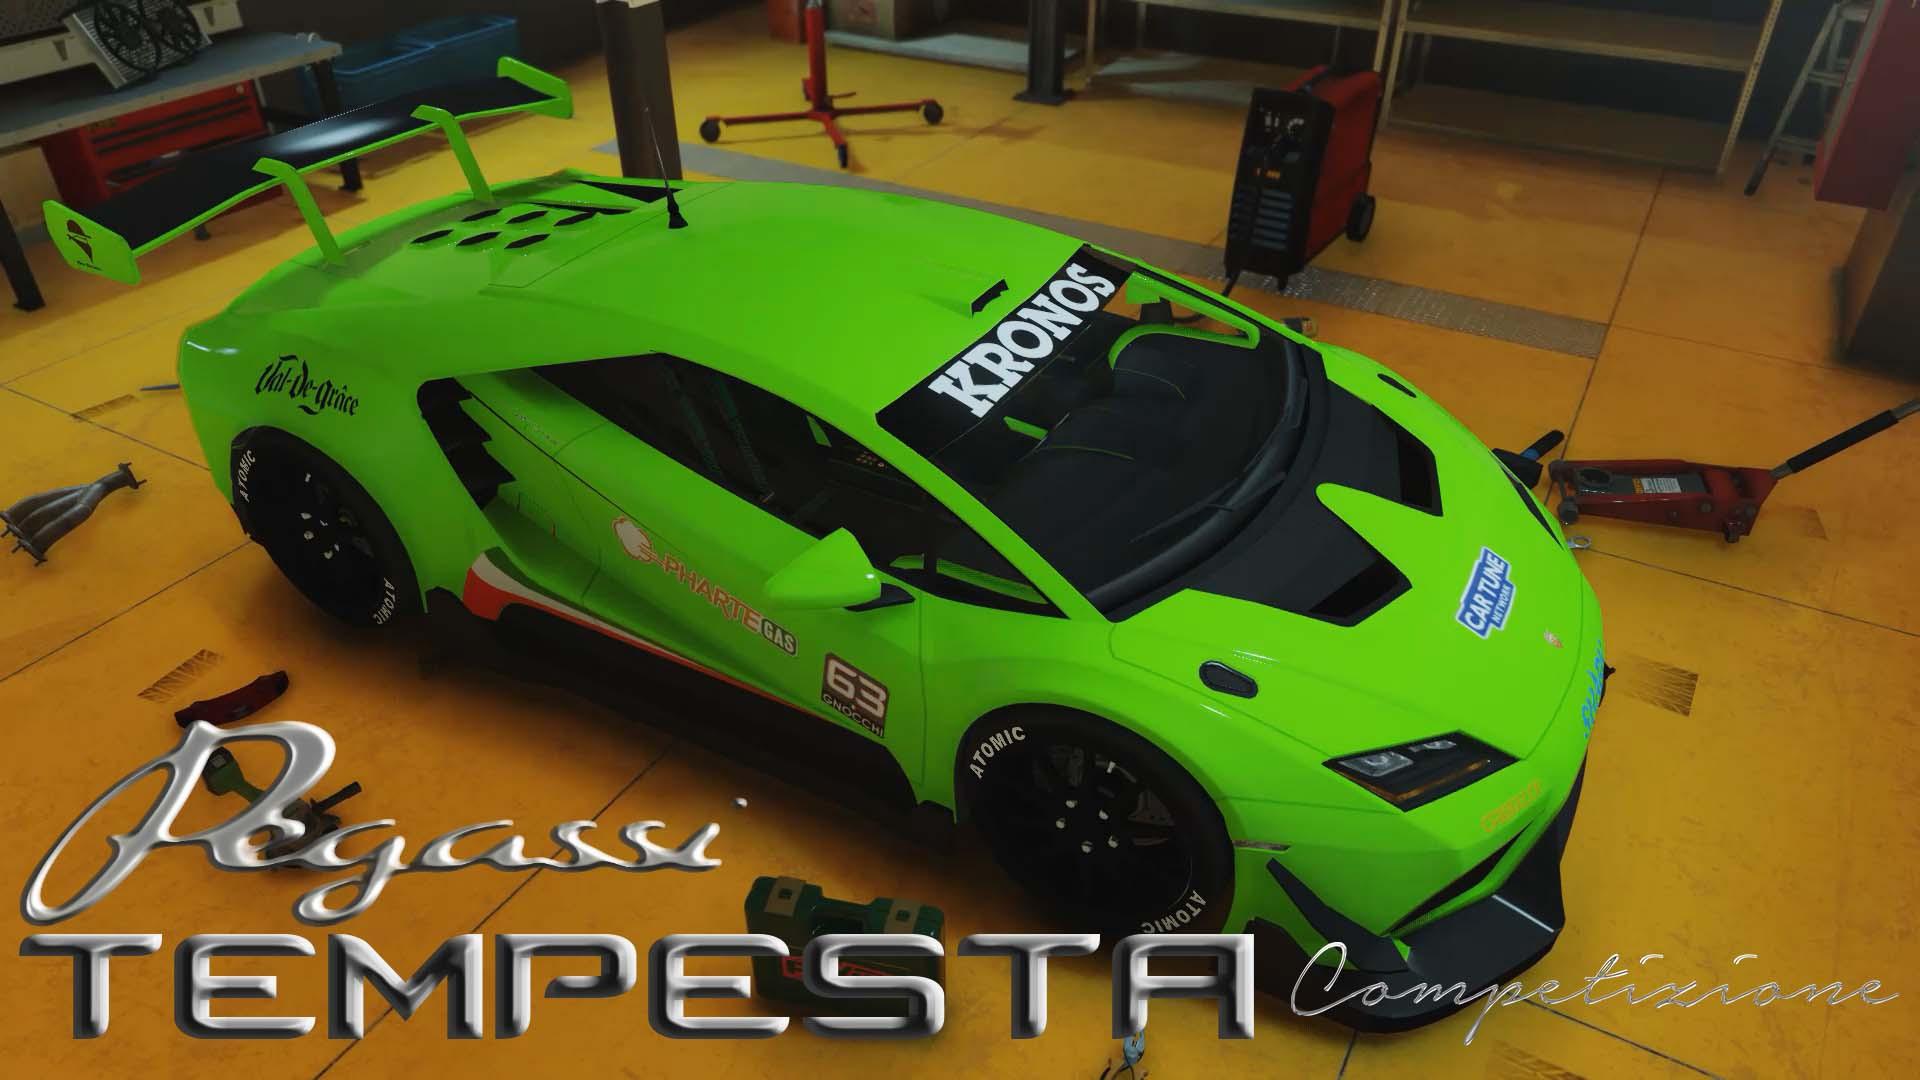 Pegassi Tempesta Competizione [Add-On / Replace] - GTA5-Mods com